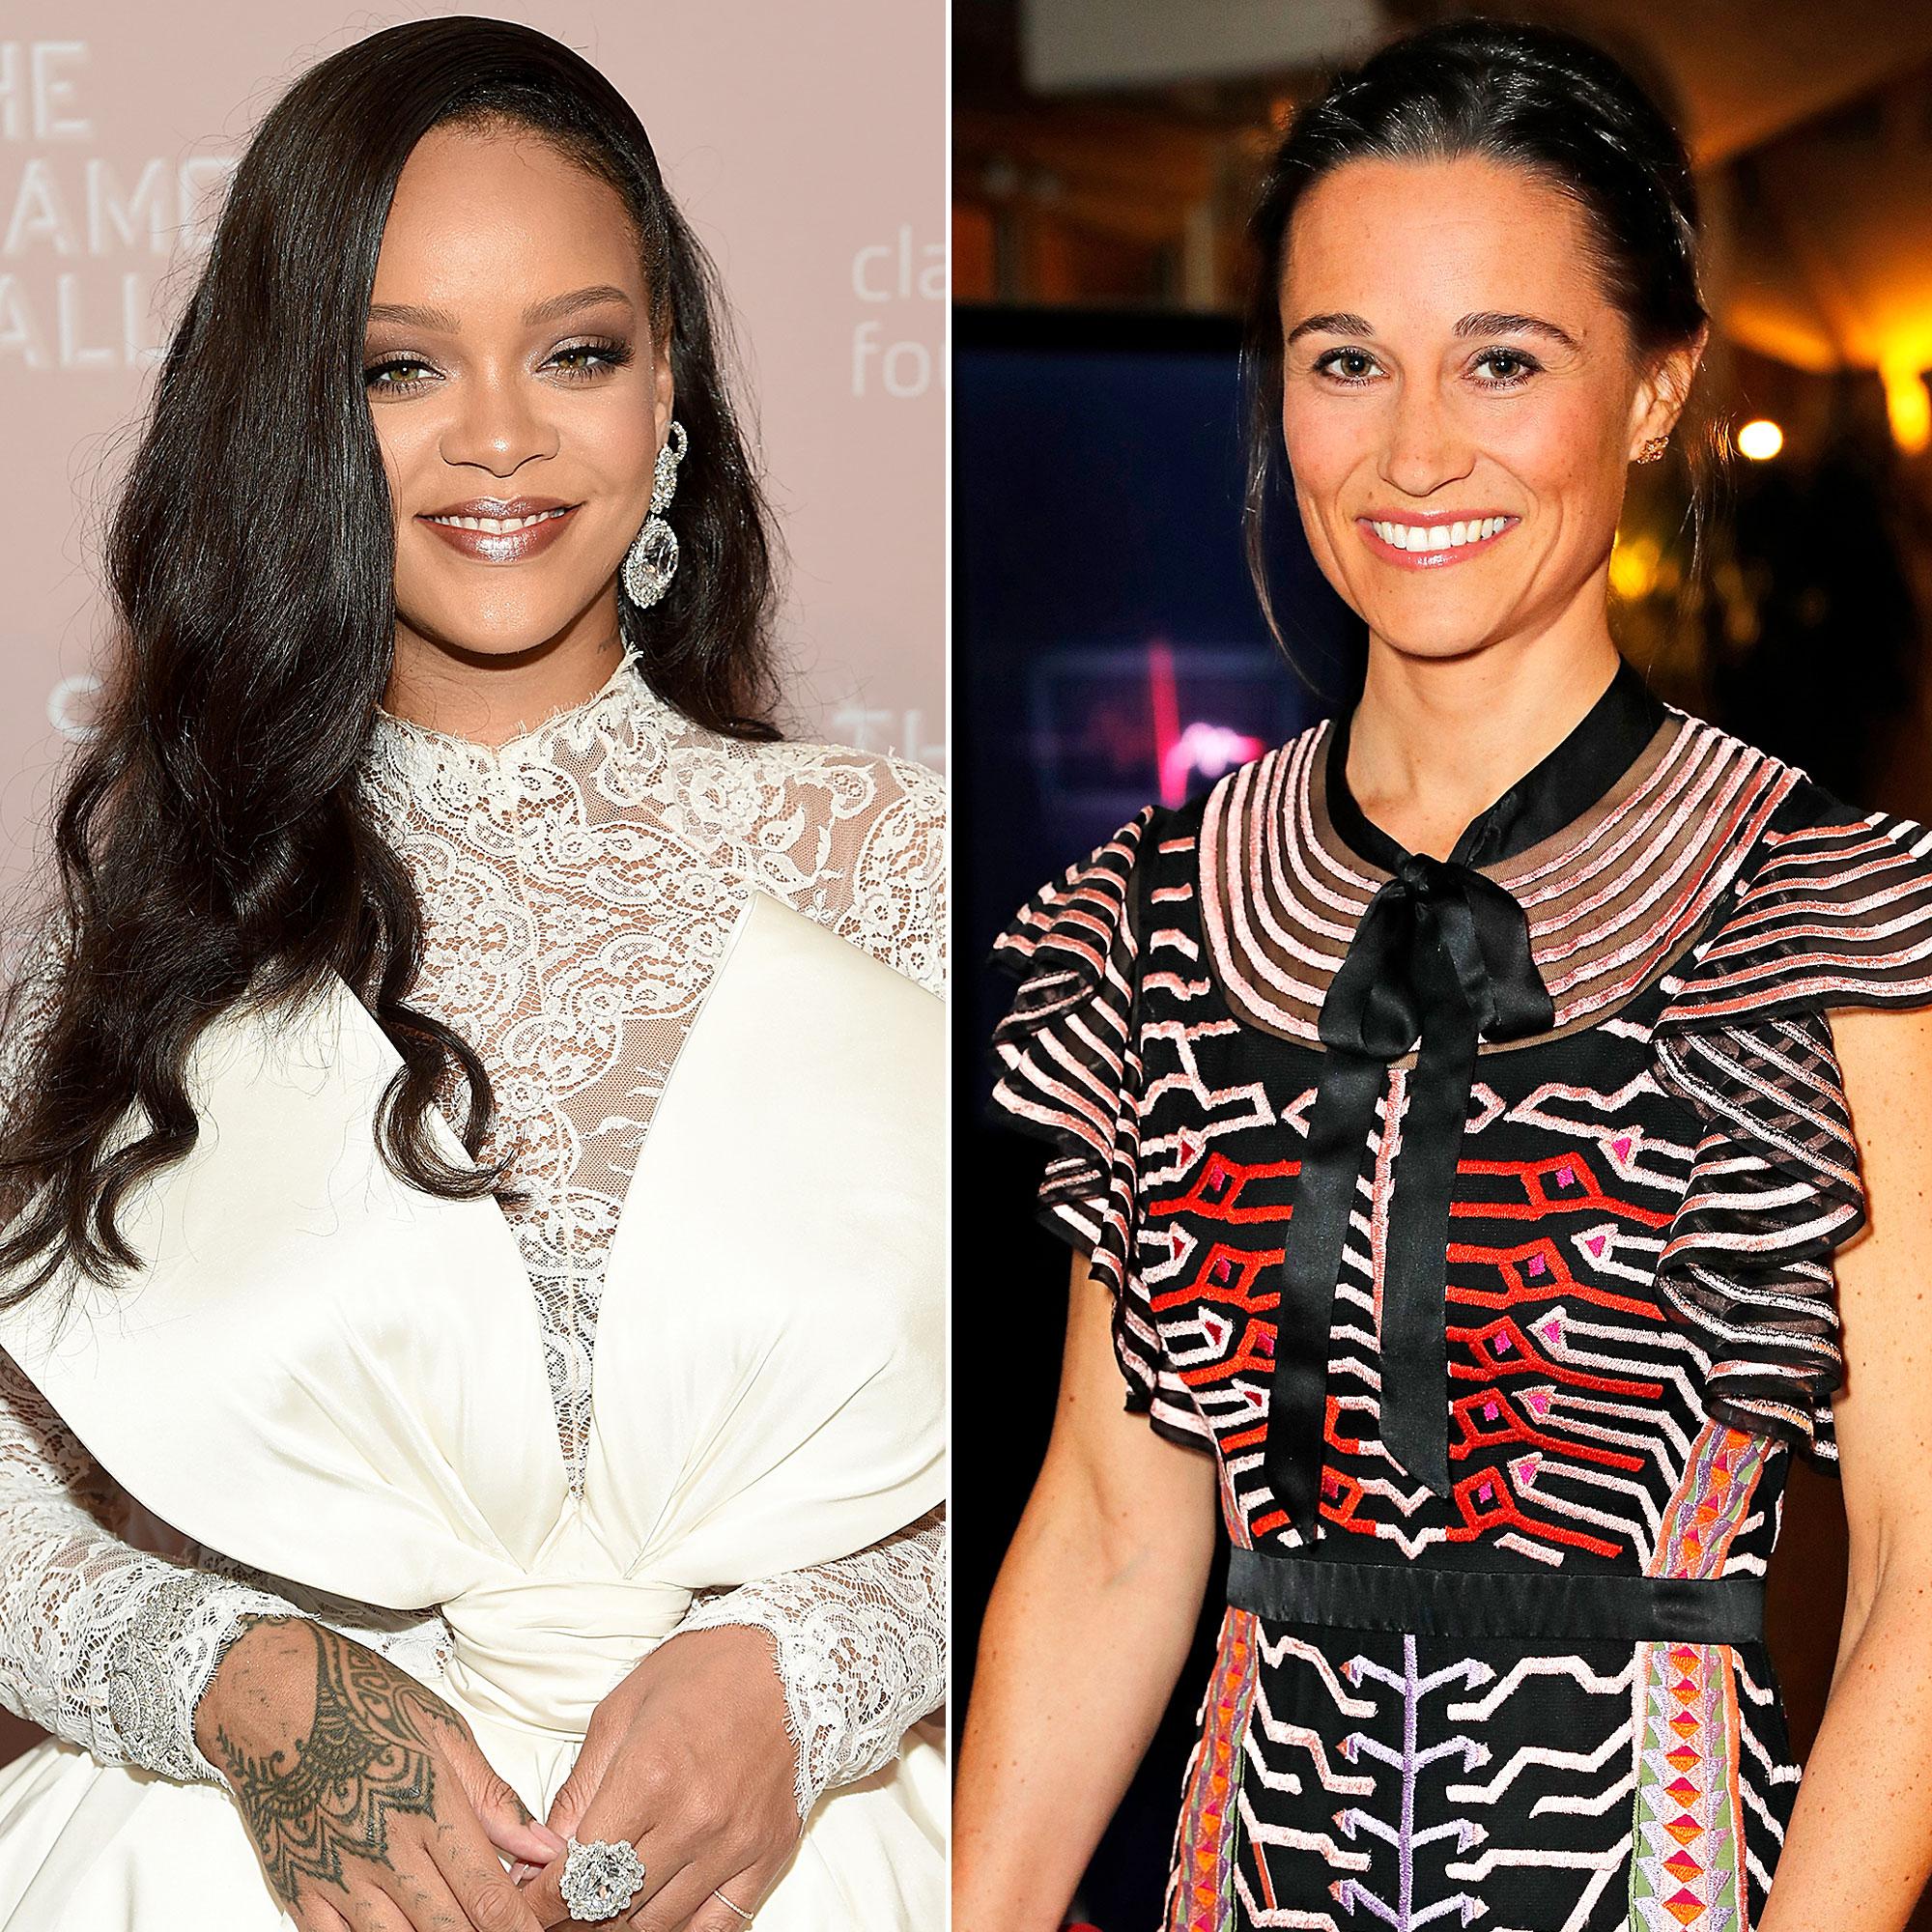 cf037d6ee6ea Celebrities Who Have Dressed Like Food  Rihanna